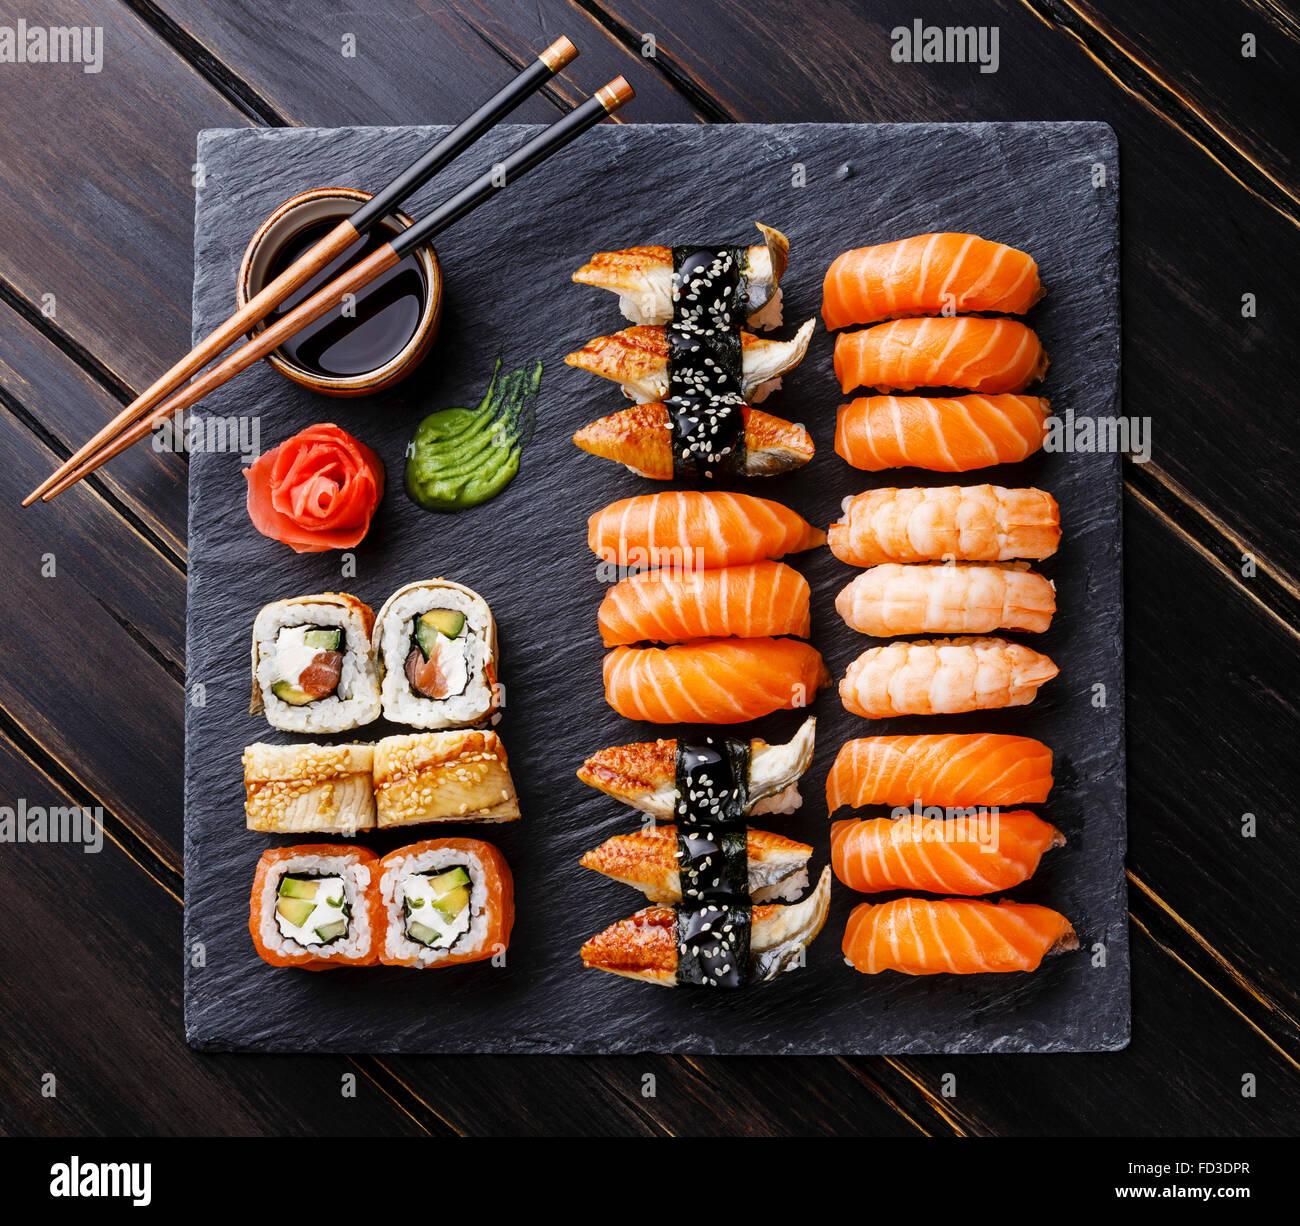 Sushi Conjunto sobre fondo de pizarra de piedra negra Foto de stock